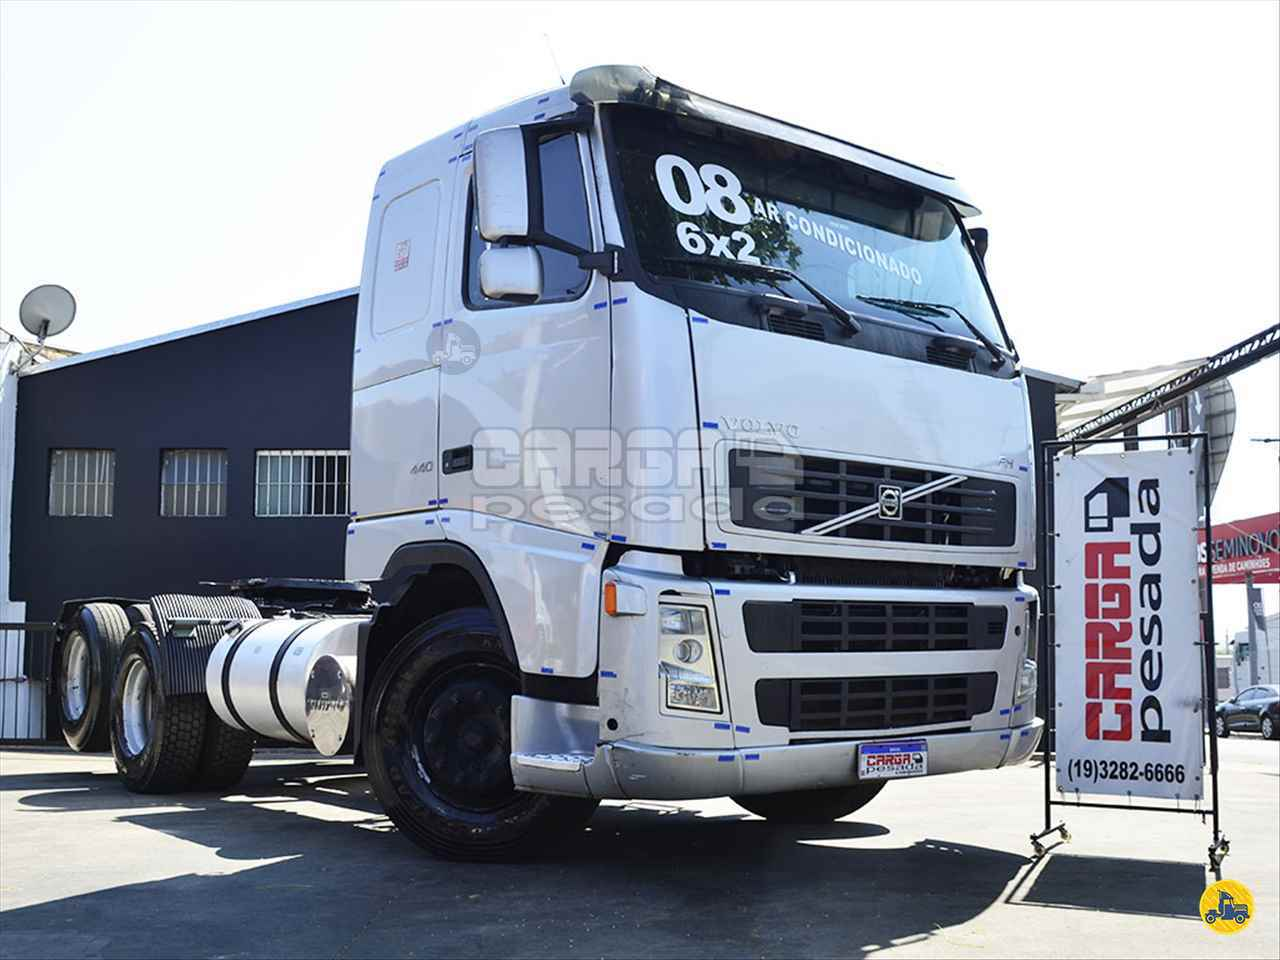 CAMINHAO VOLVO VOLVO FH 440 Cavalo Mecânico Truck 6x2 Carga Pesada Caminhões SAO PAULO SÃO PAULO SP